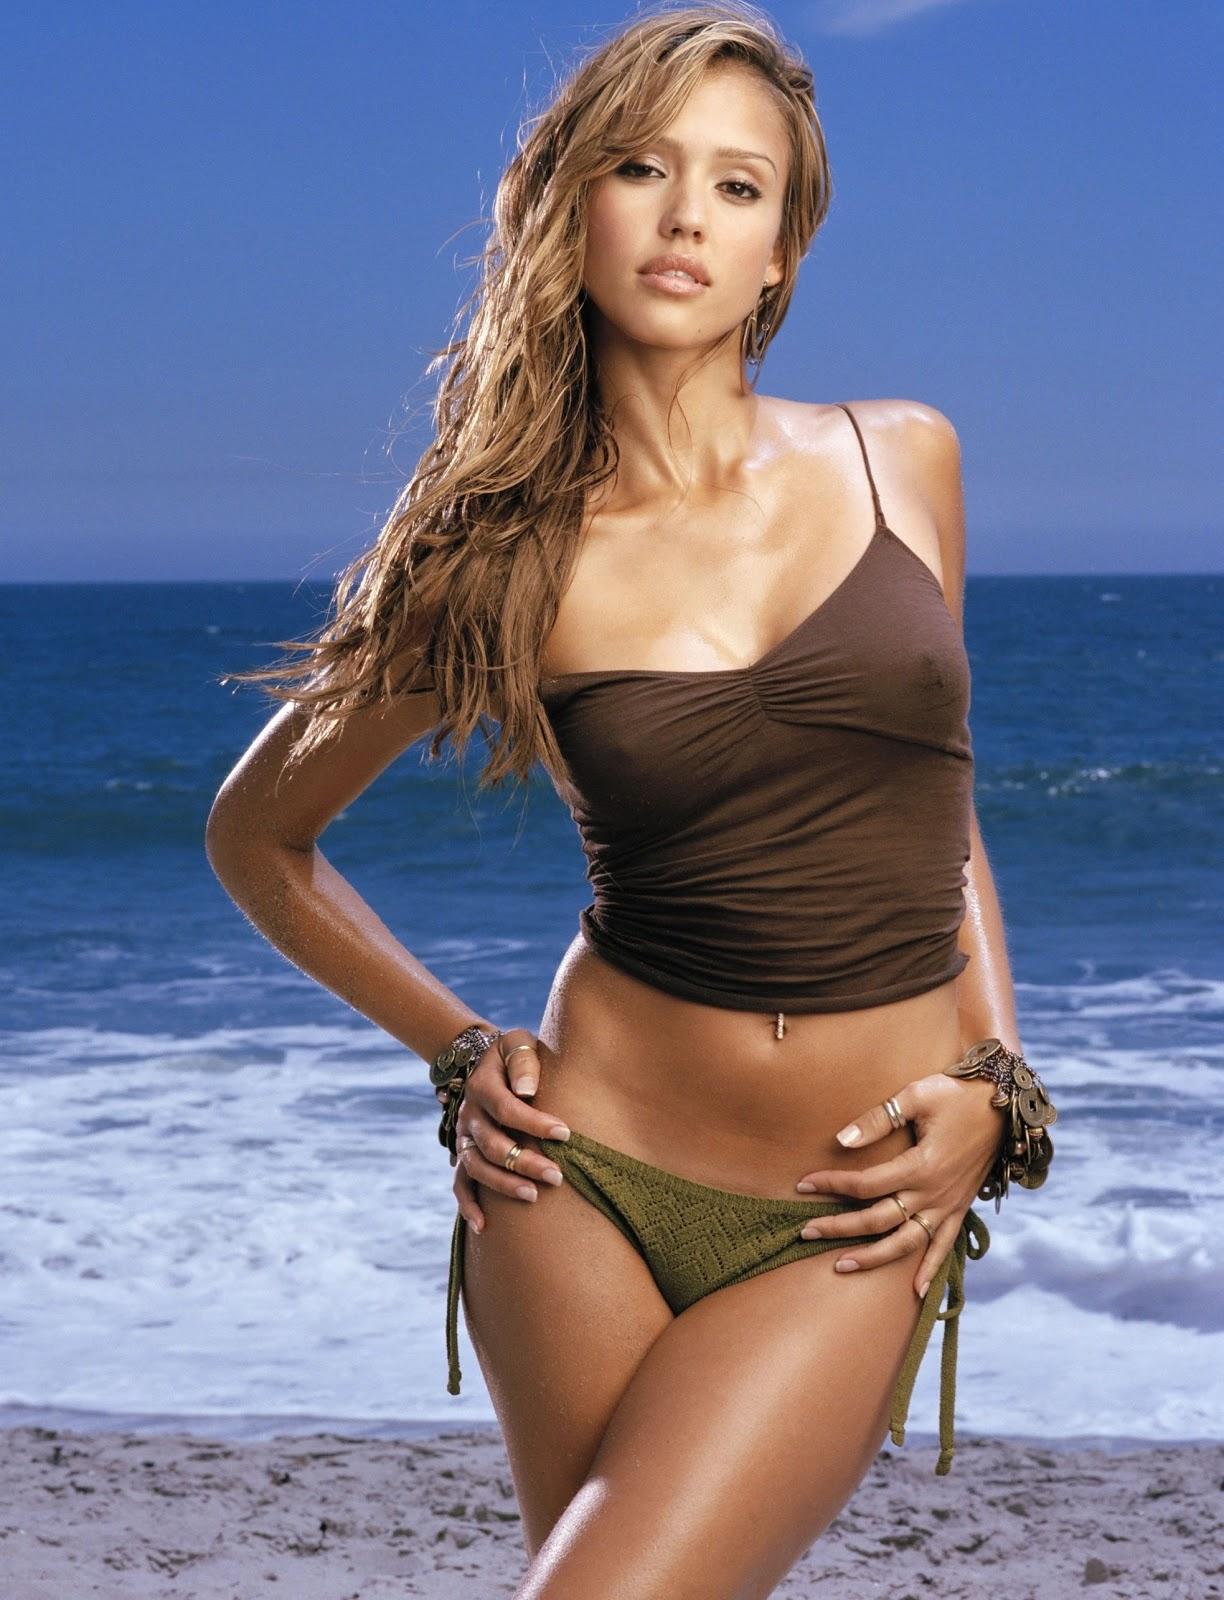 http://2.bp.blogspot.com/-Br1DepesQys/UTL1NuHak-I/AAAAAAAACYY/kYja3gQvqOE/s1600/Jessica+Alba+Wallpaper-6.jpg